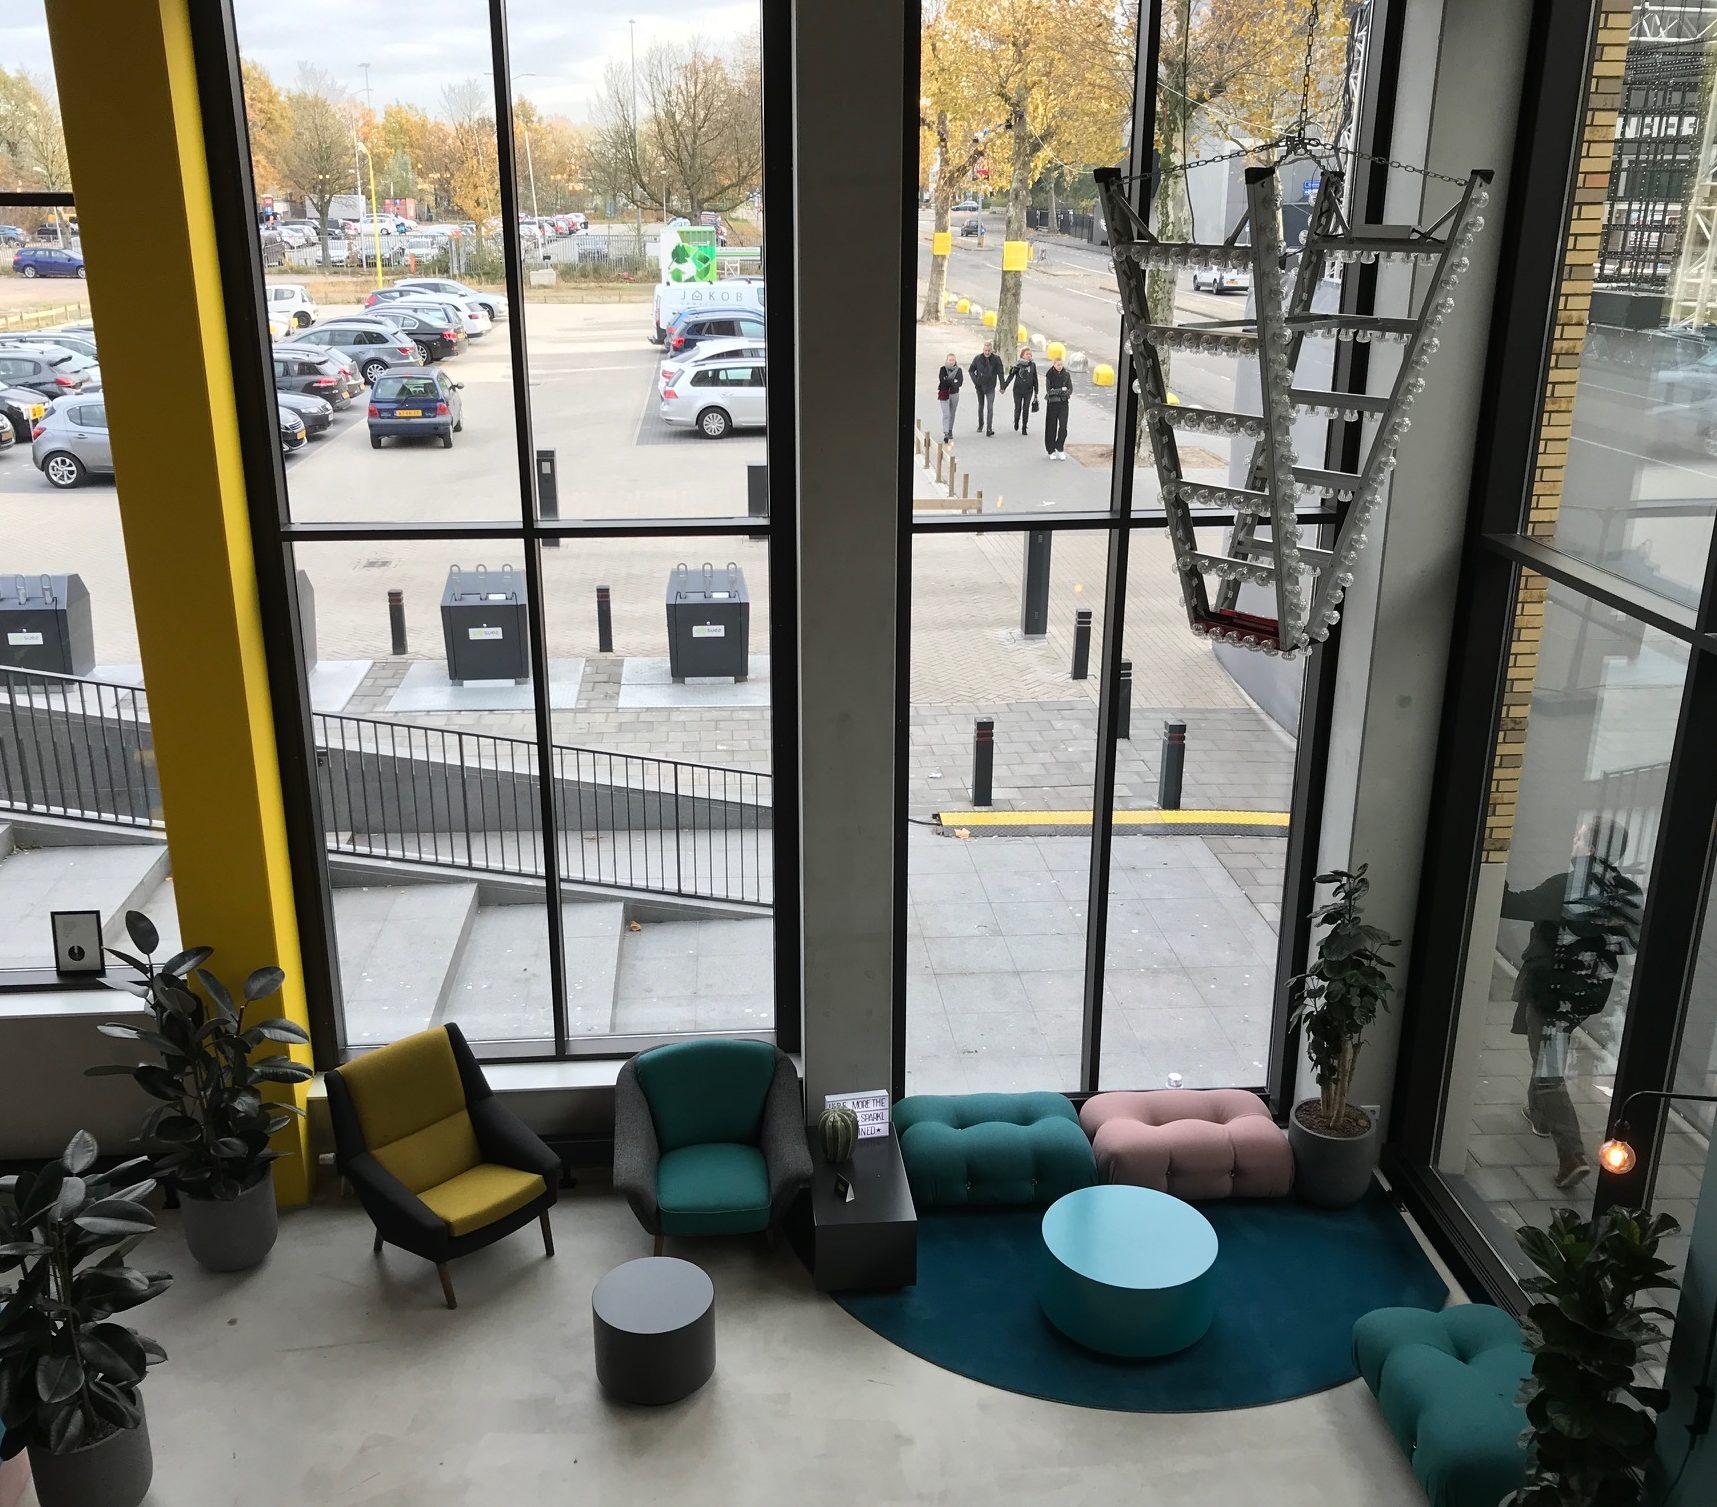 Student Hotel Eindhoven